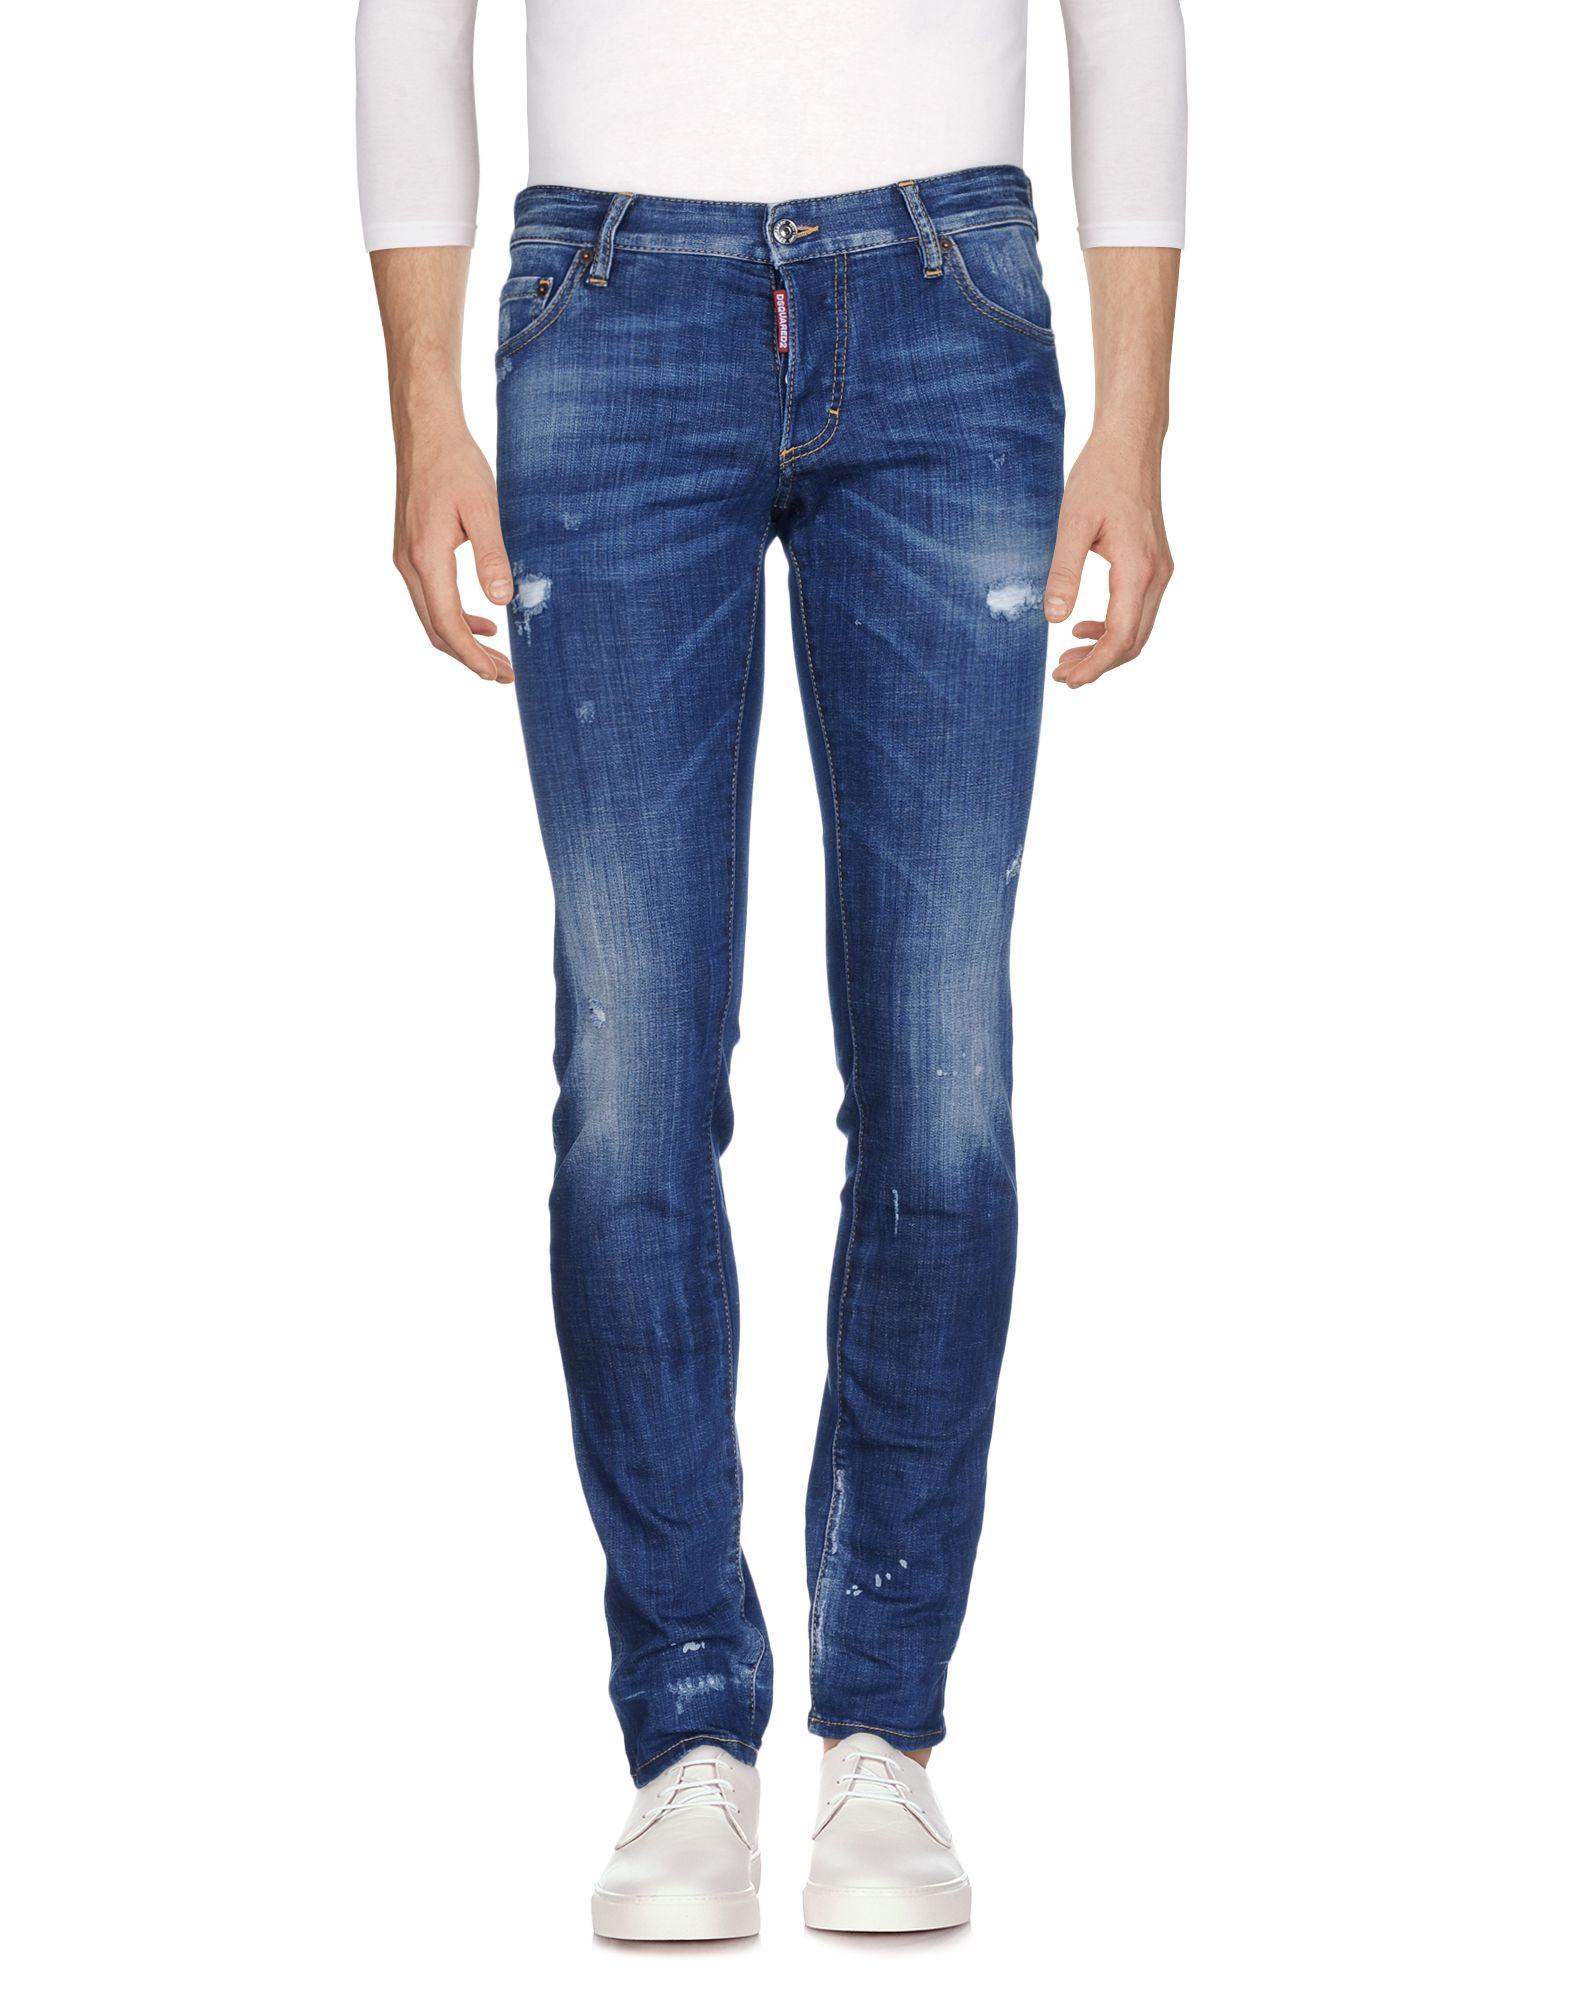 Pantaloni Jeans Uomo Dsquarosso2 Uomo Jeans - 42625625OH 6ed12c